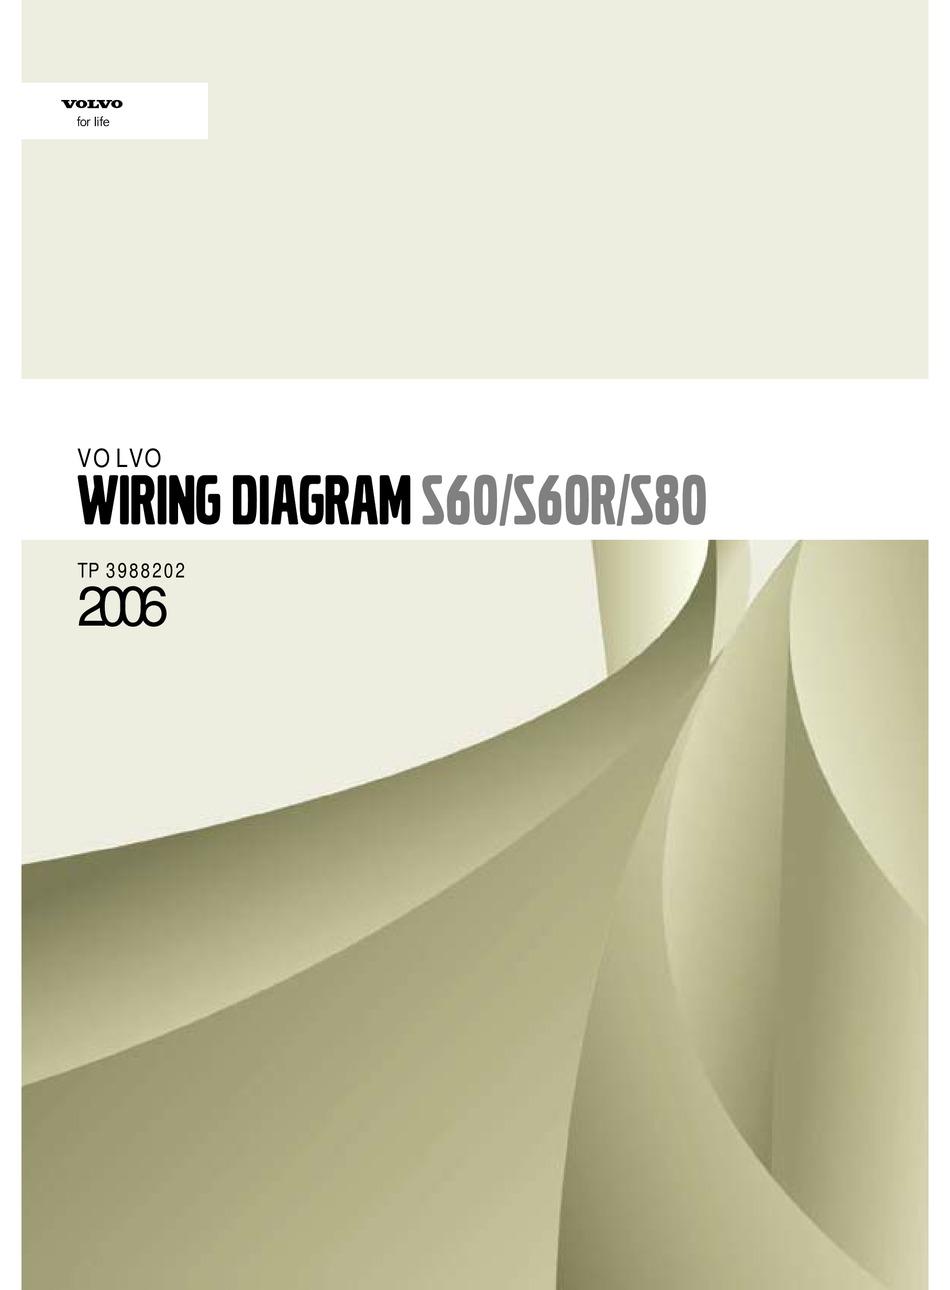 VOLVO S60 WIRING DIAGRAM Pdf Download | ManualsLib | Volvo Wiring Diagrams S80 |  | ManualsLib